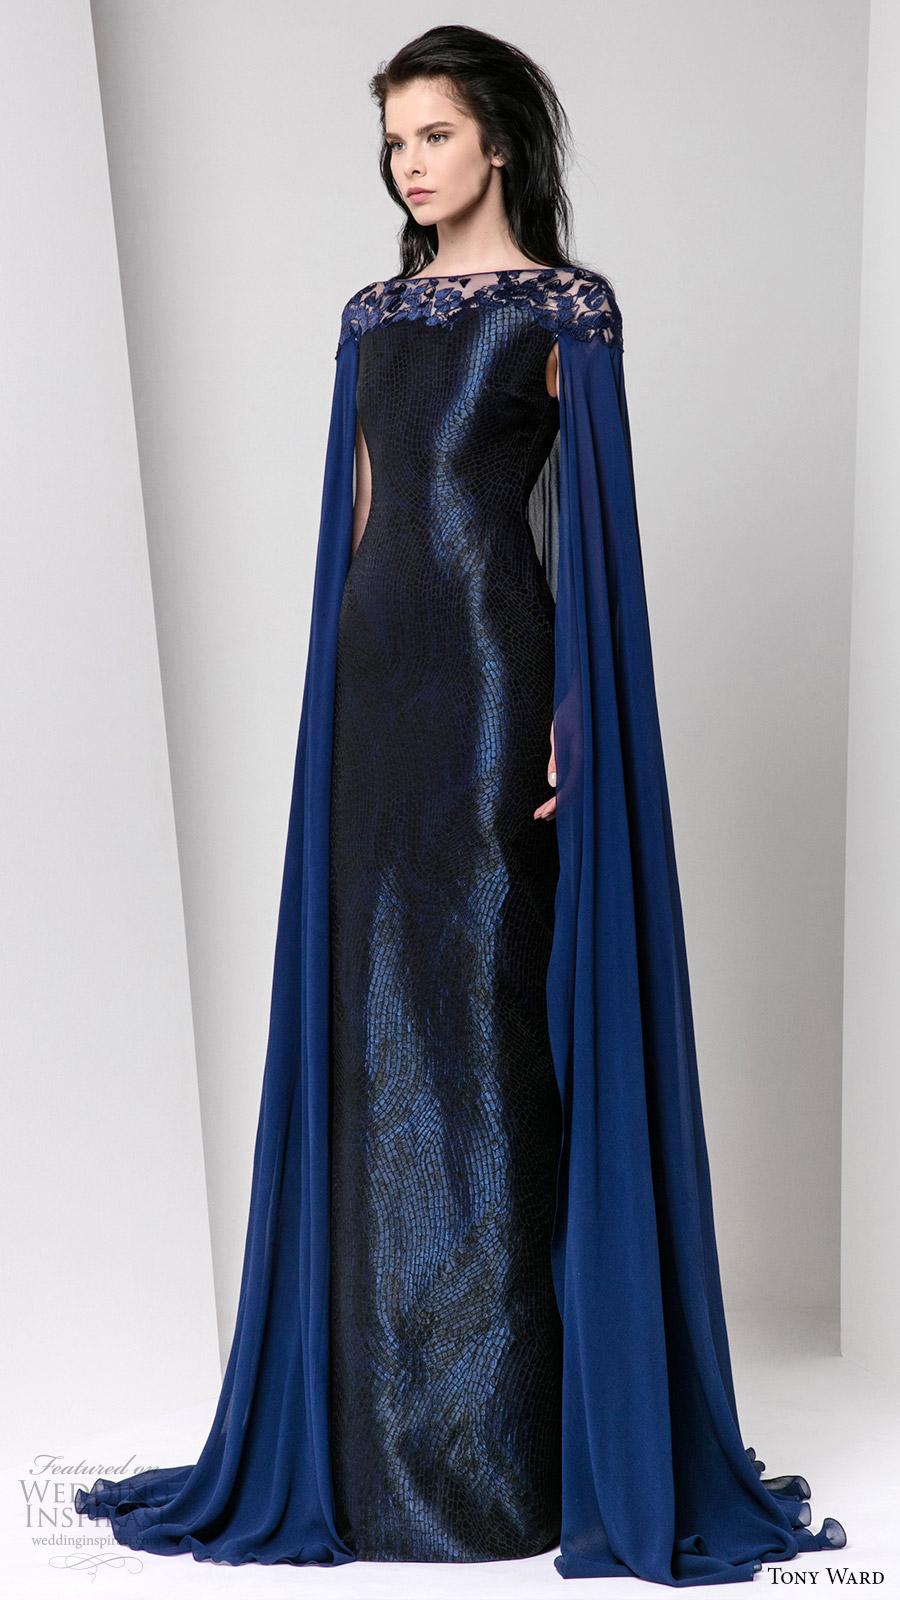 tony ward fall winter 2016 2017 rtw cape sleeves illusion bateau neckline sheath evening dress deep blue wedding inspiration